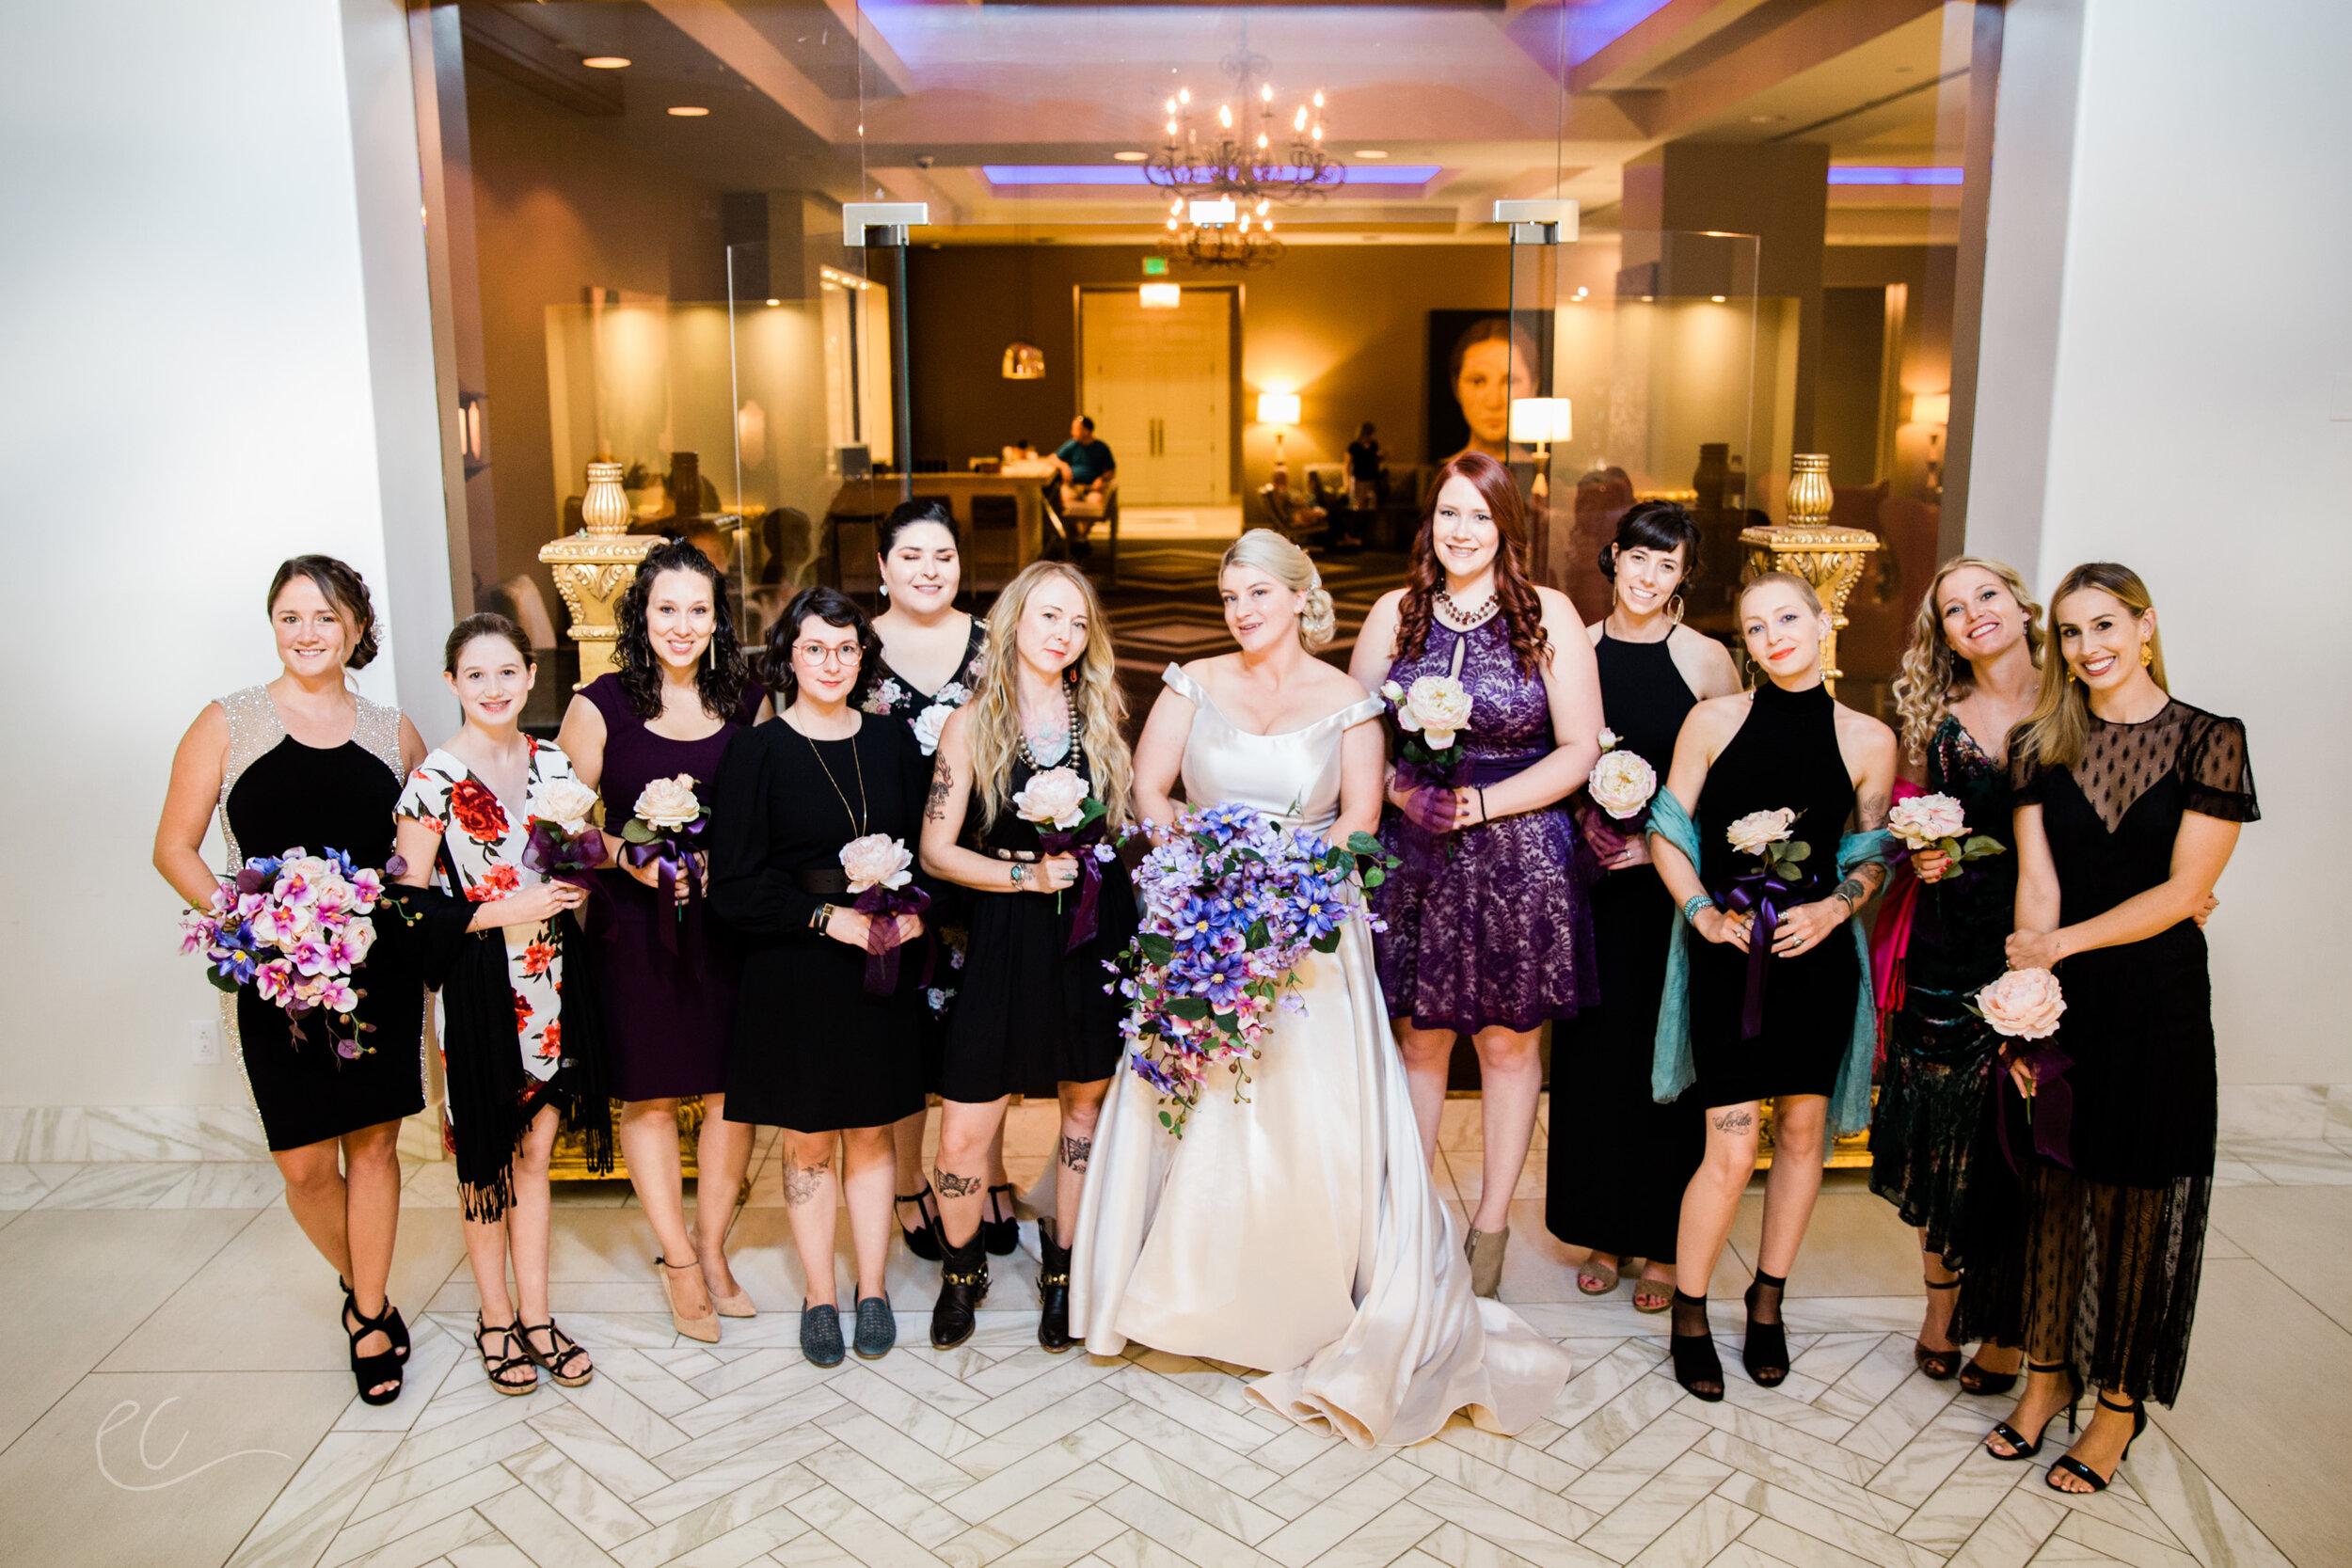 Santafe_wedding_photography_kellyzac-30.jpg